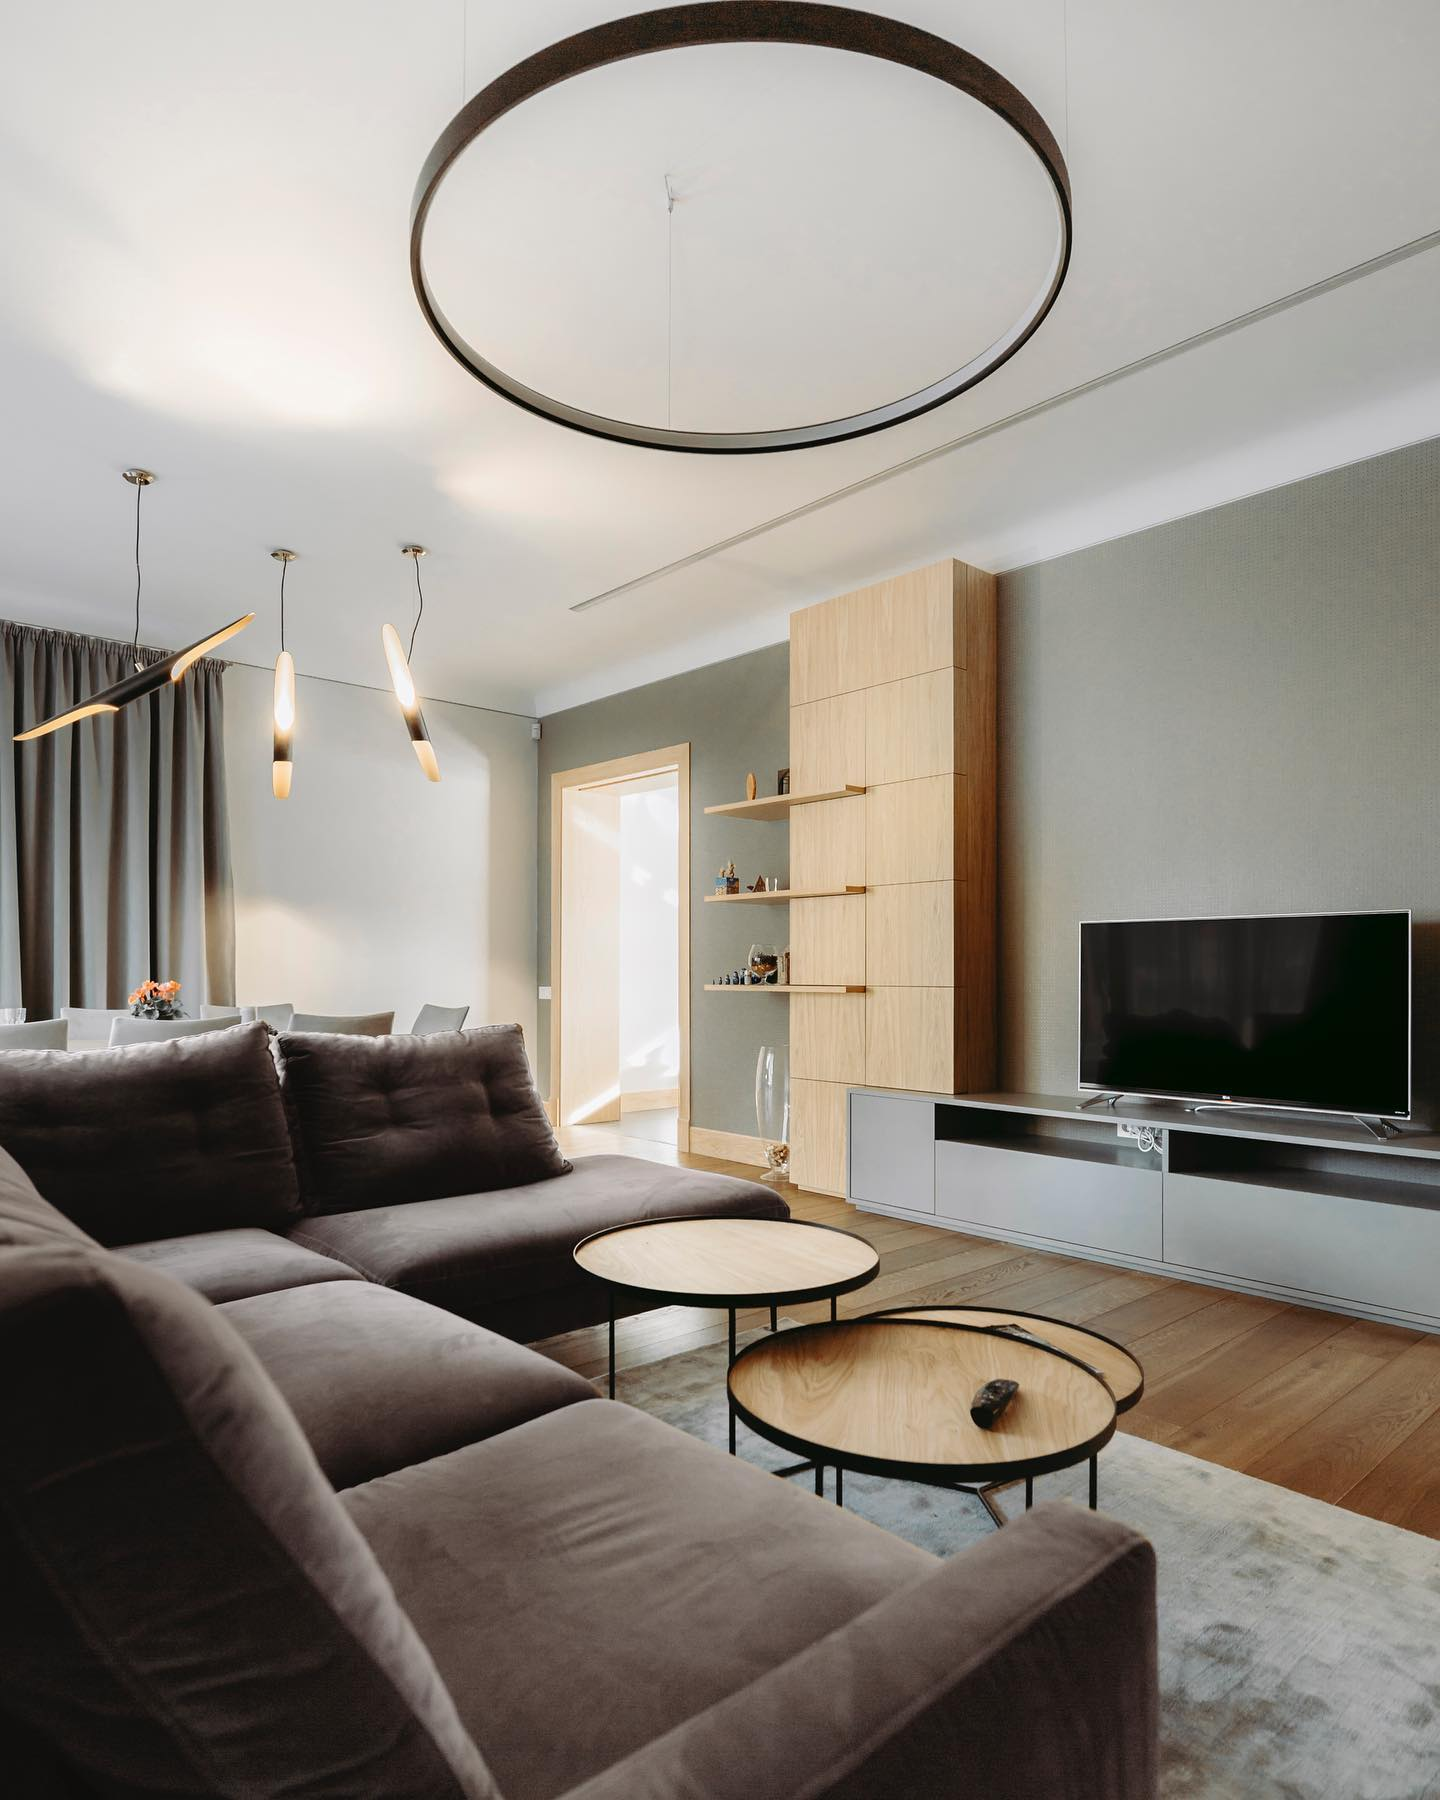 20 Extraordinary Interior Designers in Riga for You to Admire. interior designers 20 Extraordinary Interior Designers in Riga for You to Admire 20 Impressive Interior Designers in Riga for You to Admire15